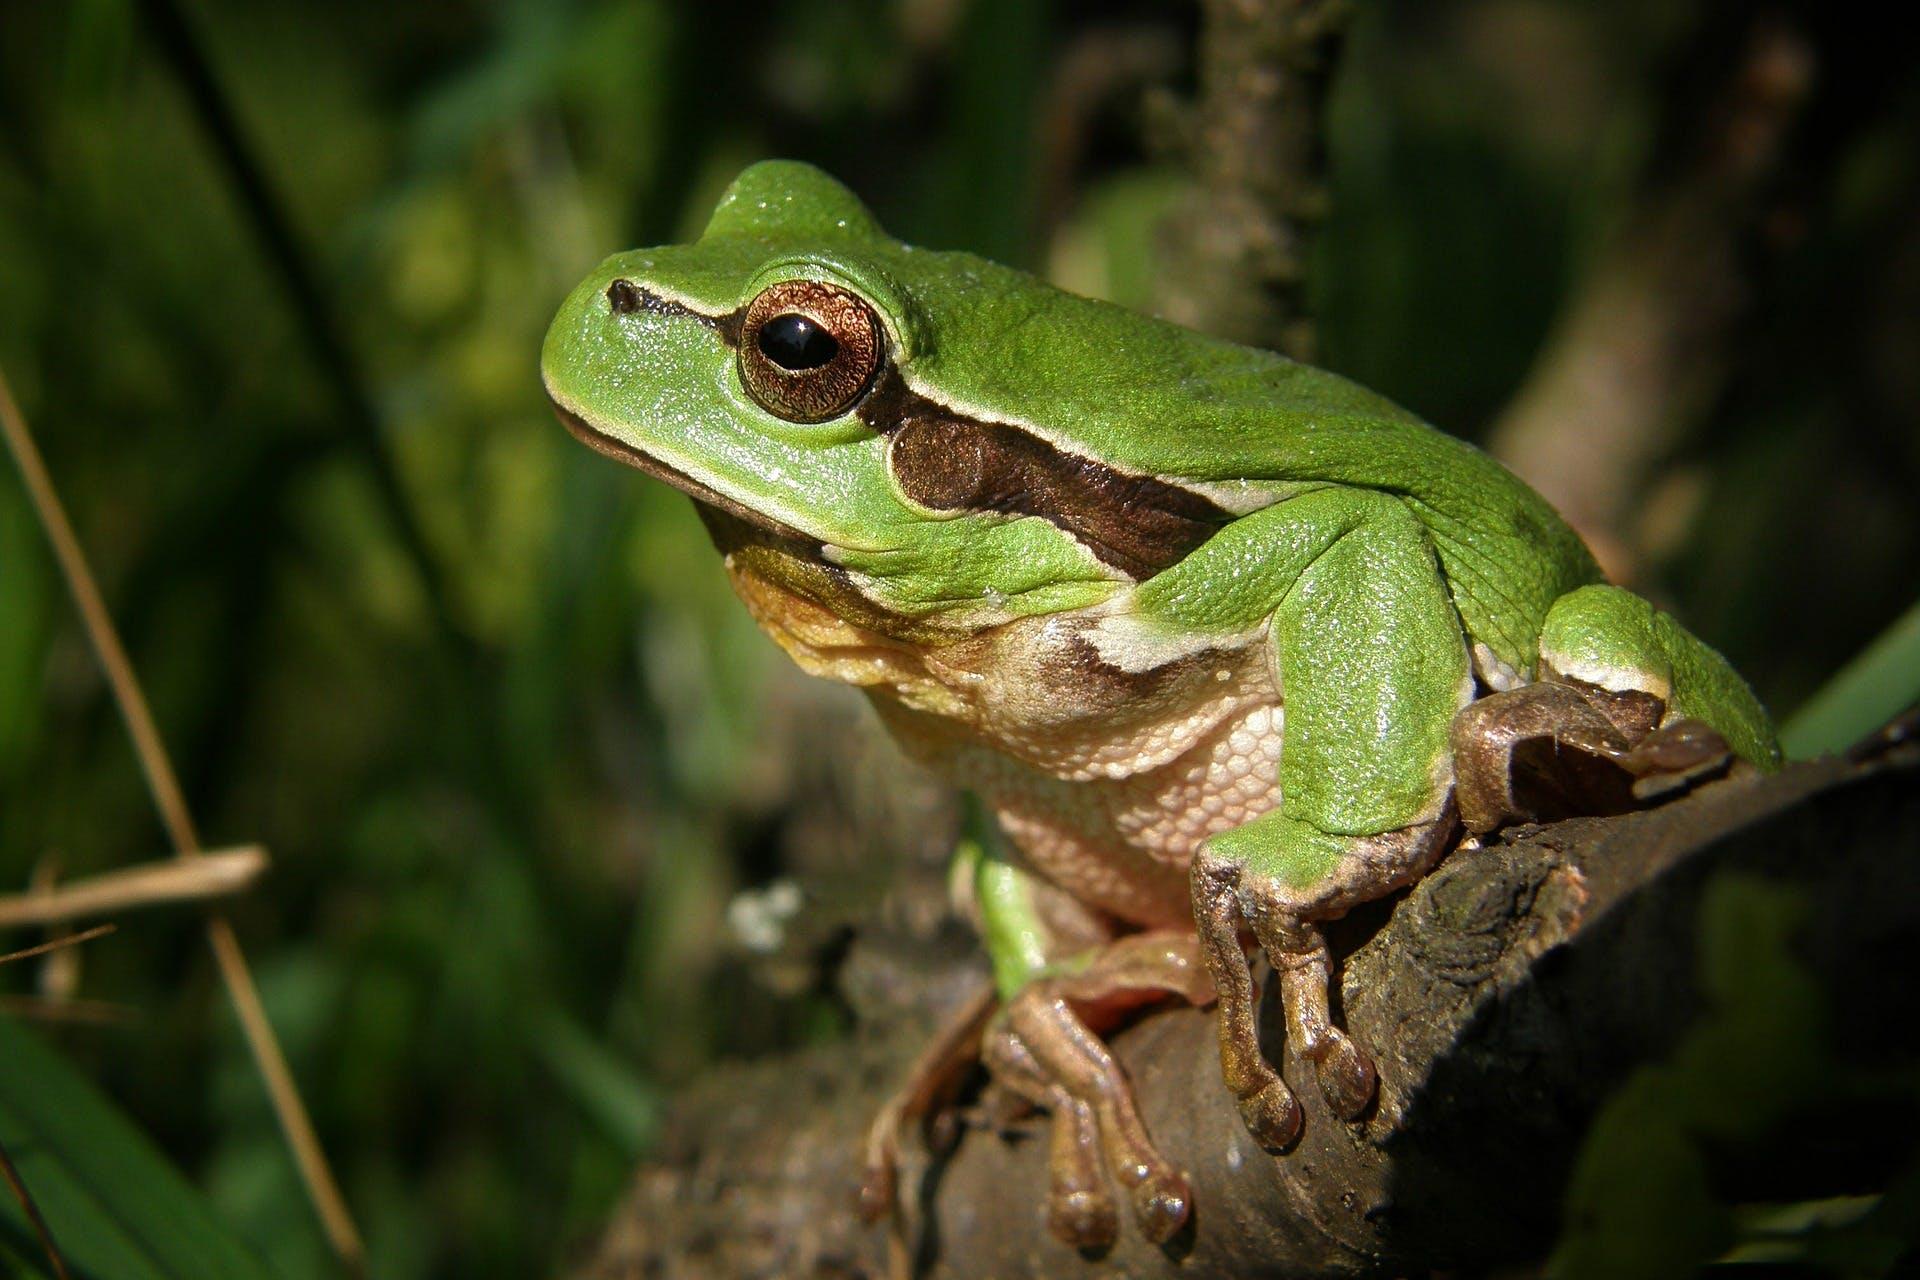 Photos gratuites de amphibien, animal, grenouille, grenouille arboricole